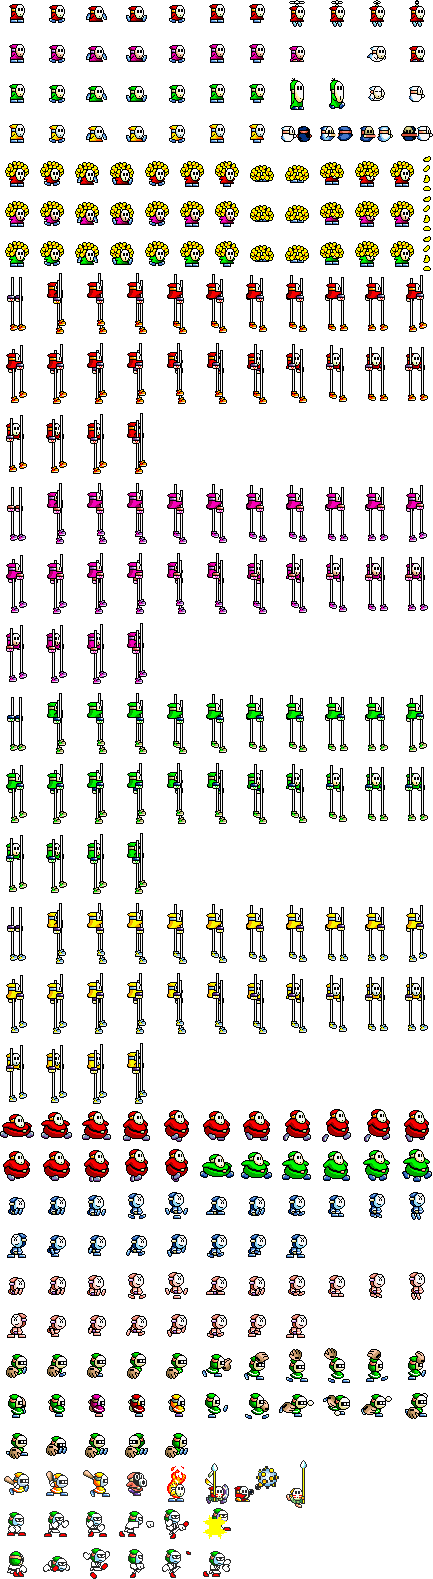 density of sprite